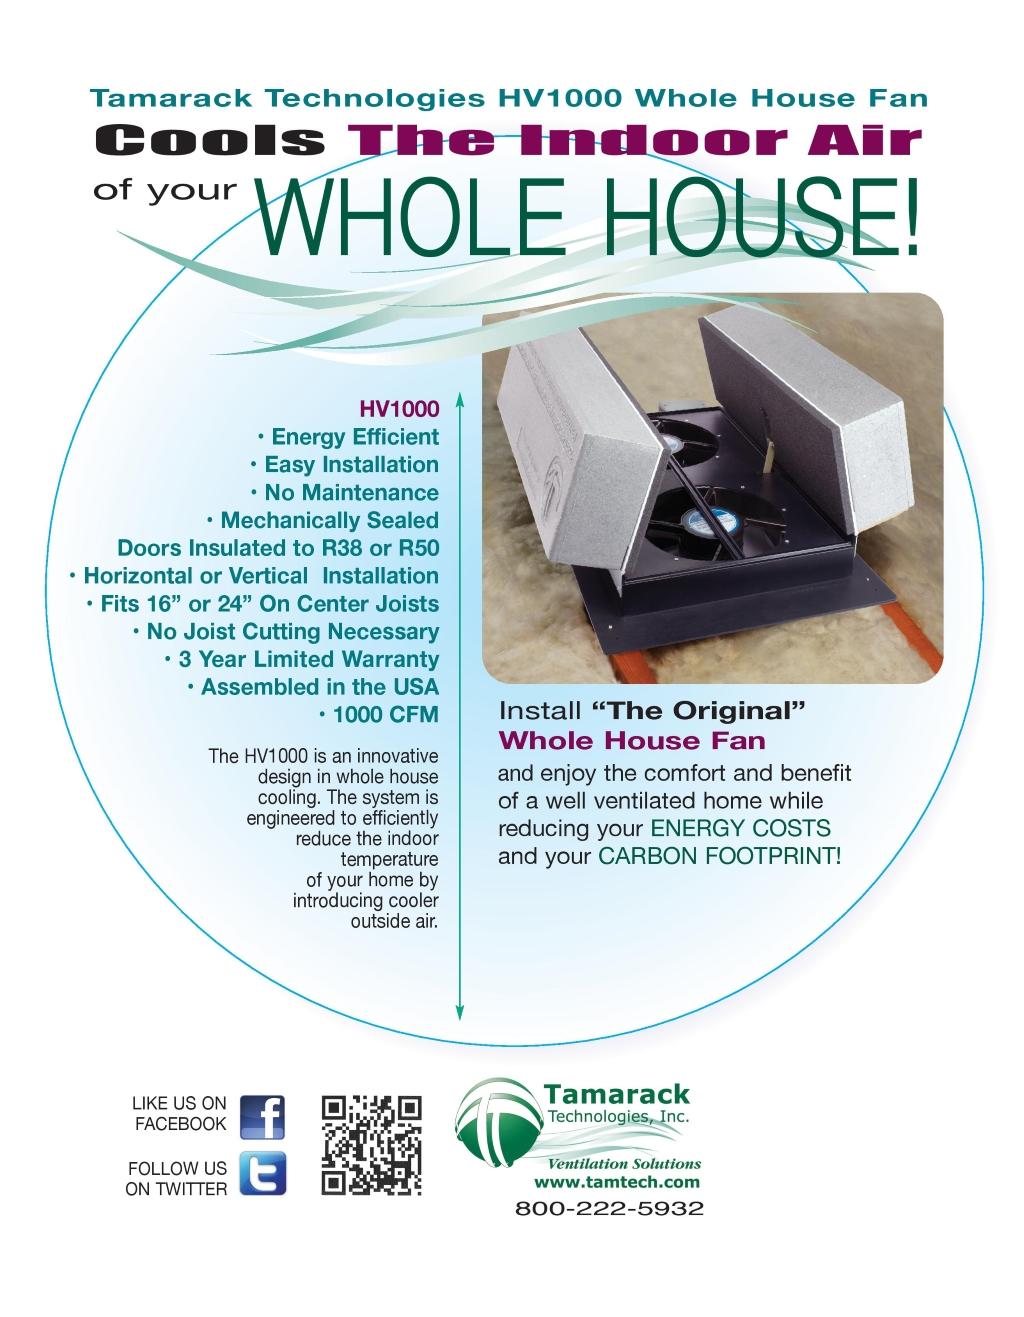 HV1000 R38 Whole House fan - Tamarack Technologies